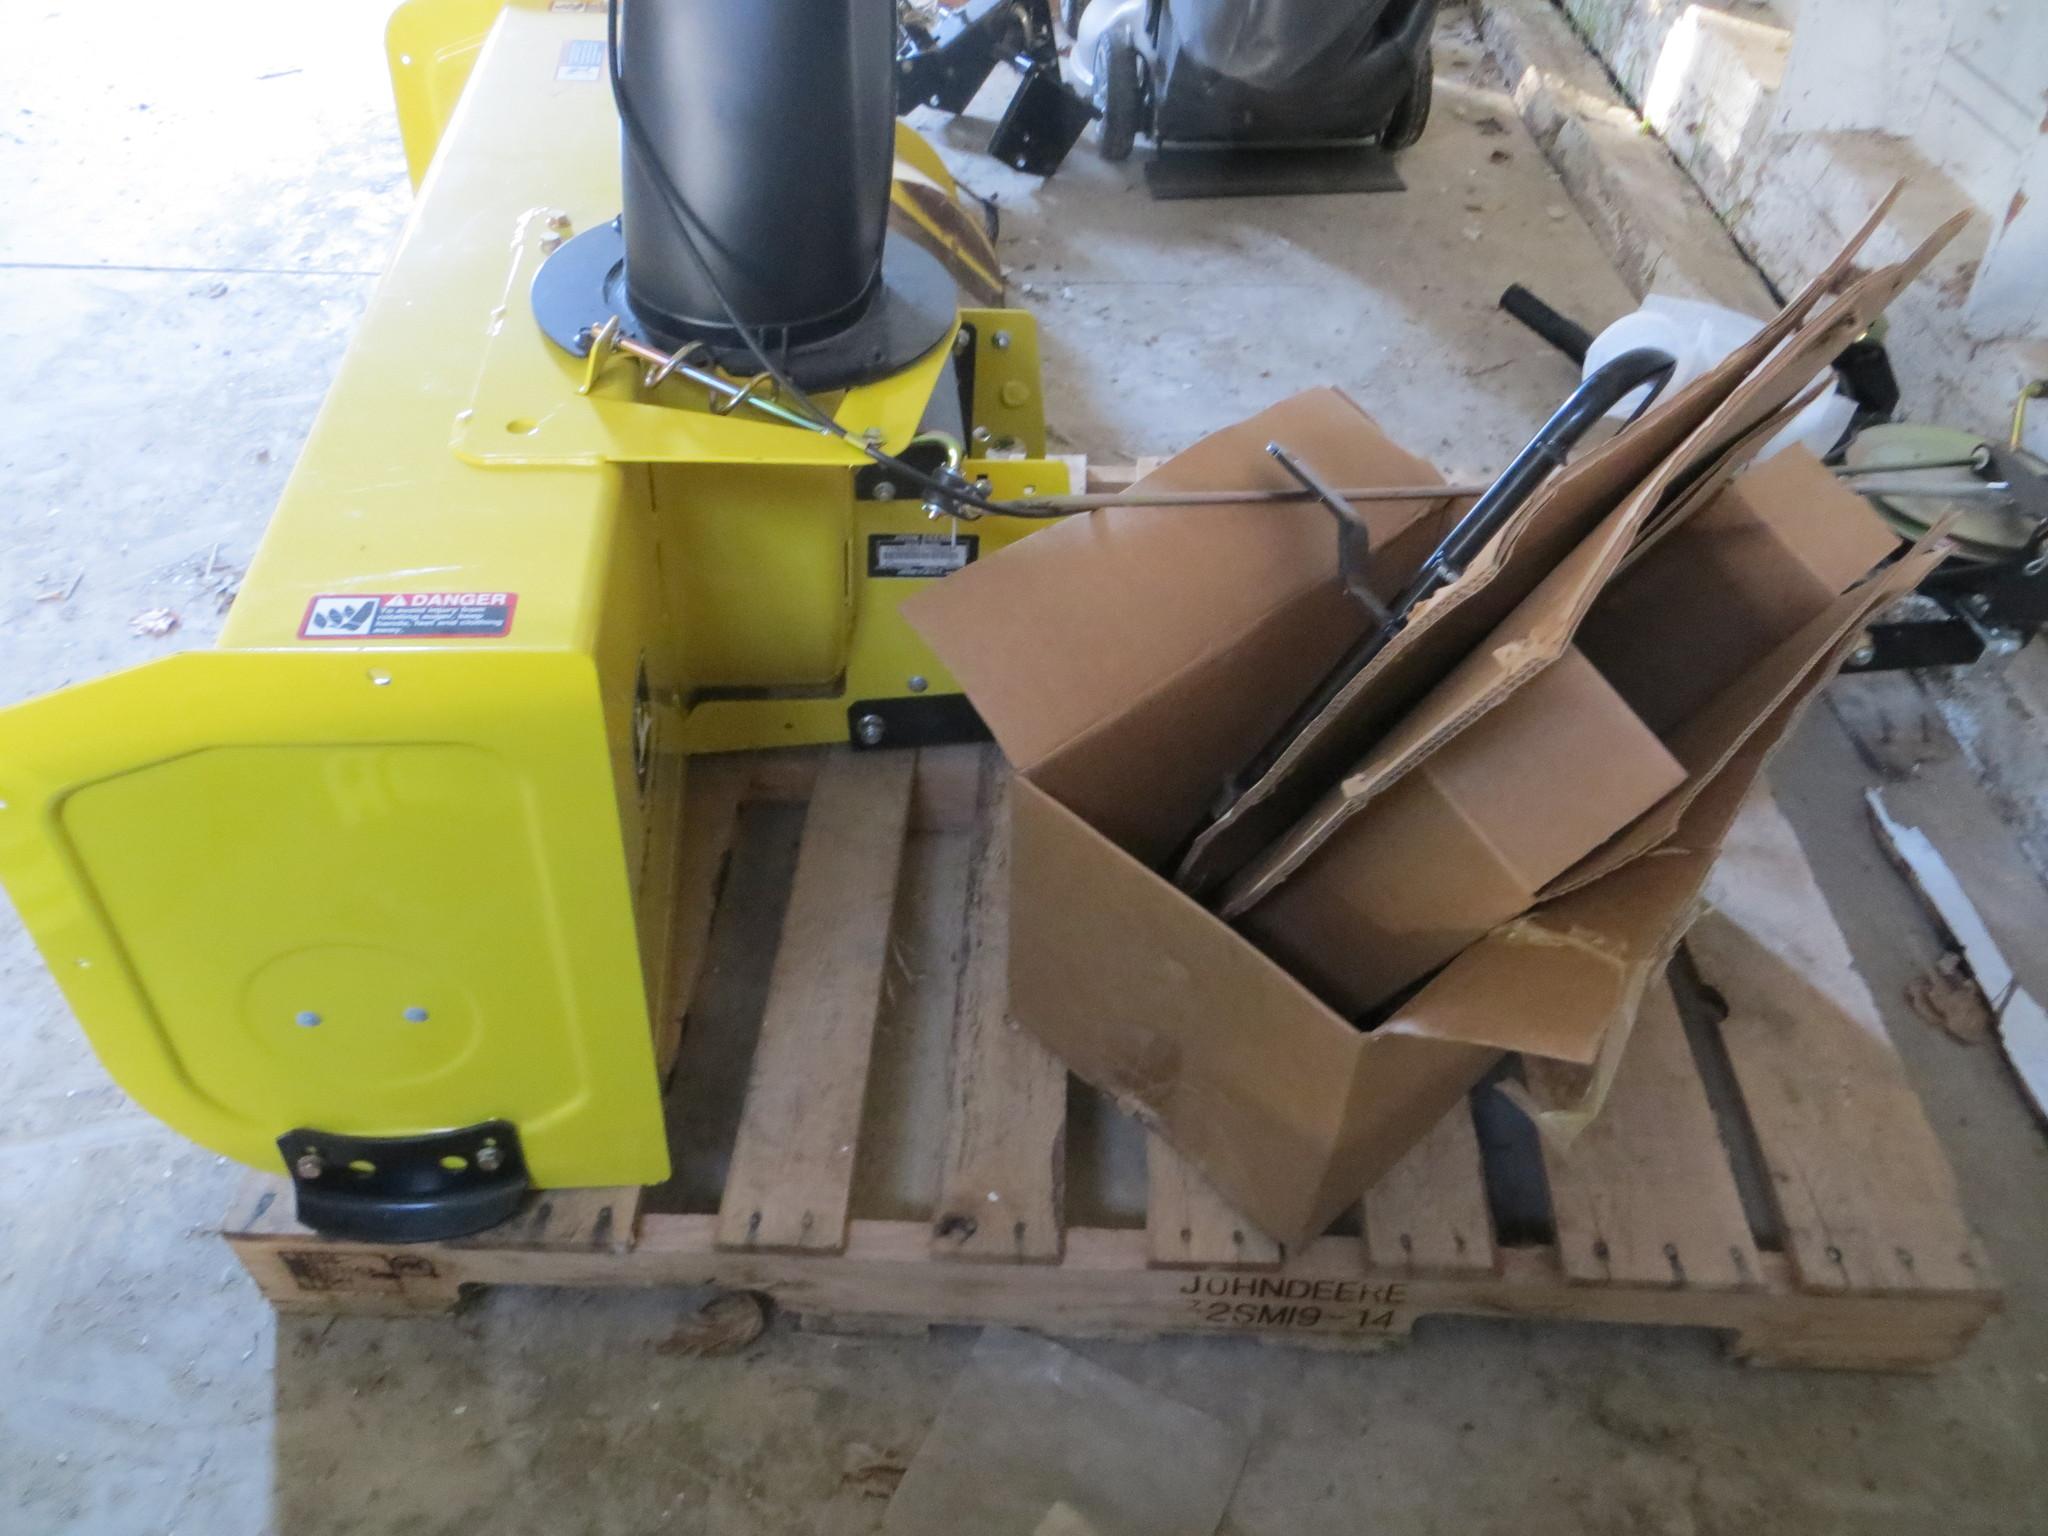 Honda Bloomington Il >> John Deere 44 SNOW BLOWER Attachments for Lawn & Garden Tractors for Sale   [41023]